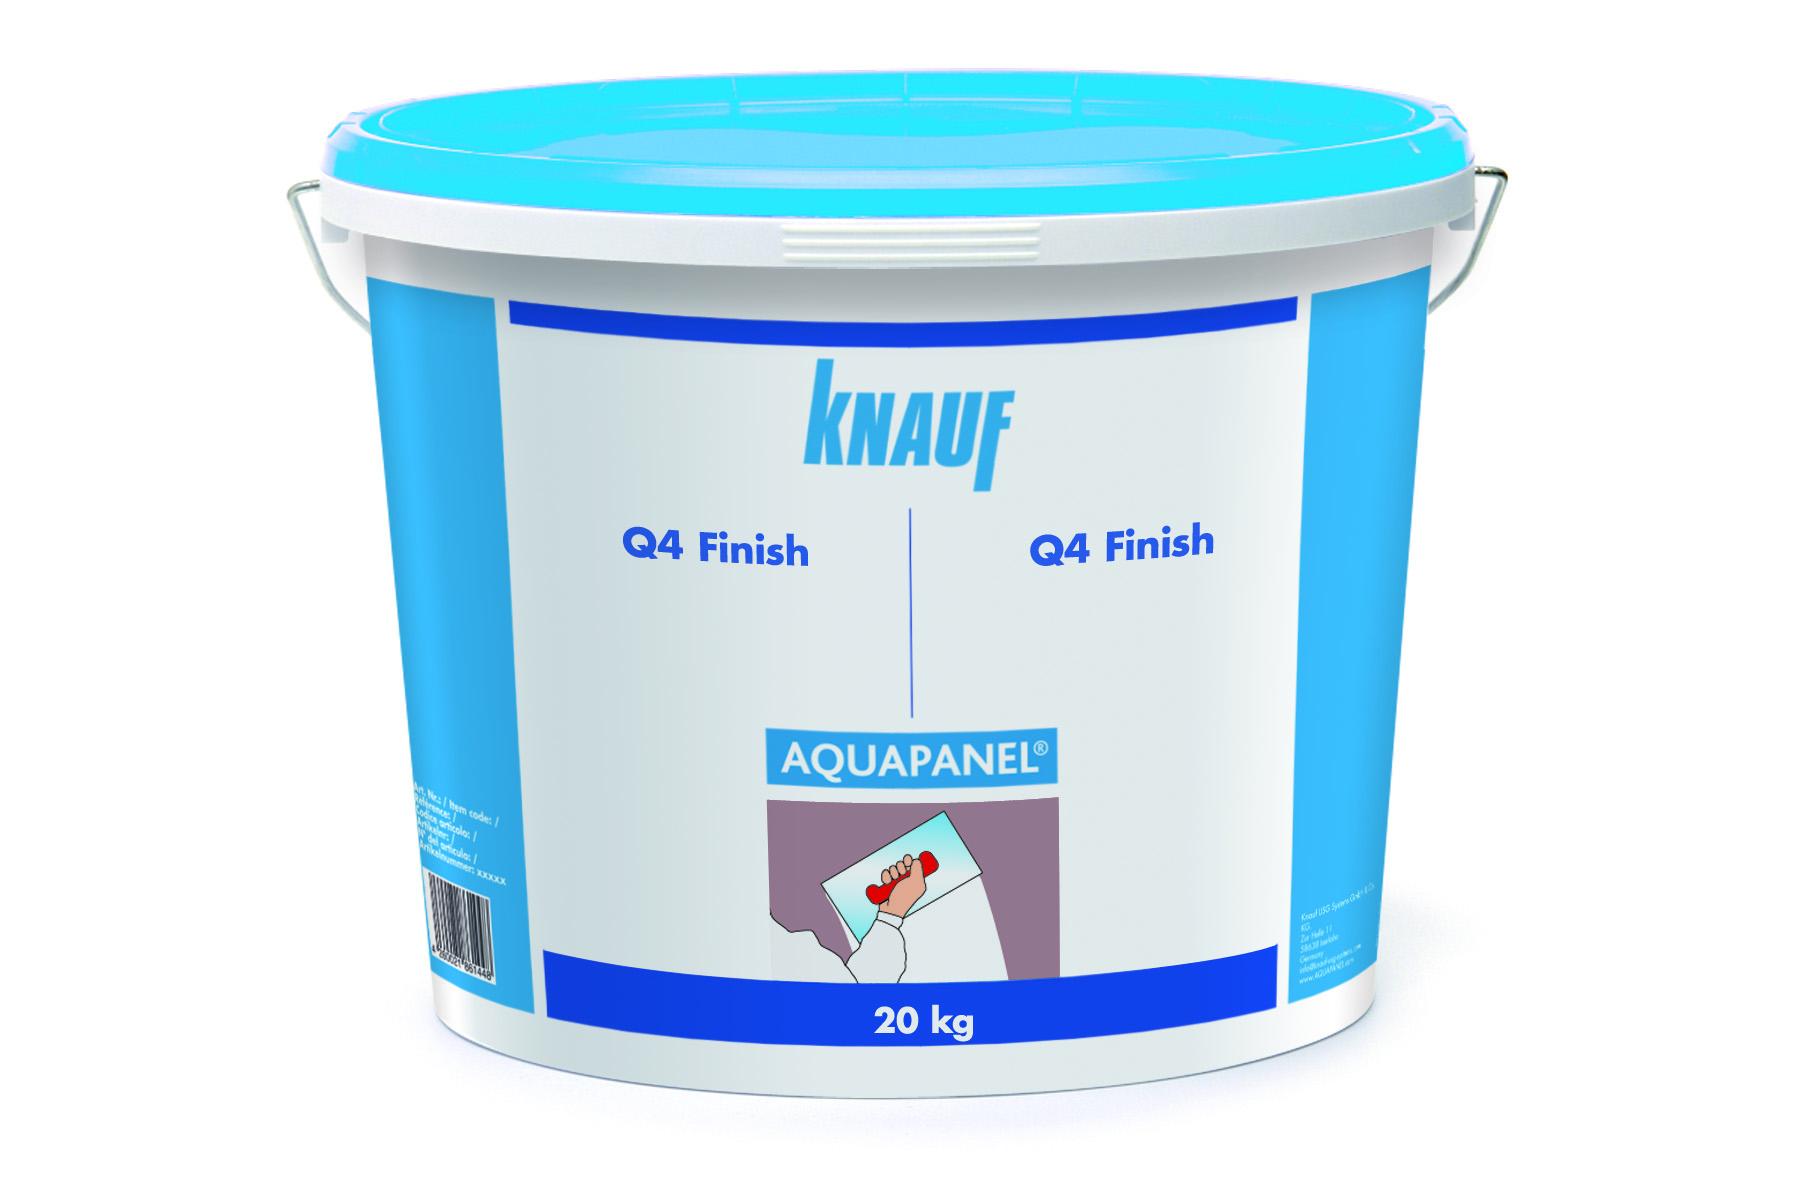 knauf aquapanel q4 finish 20 kg/eimer | www.kemmler.de